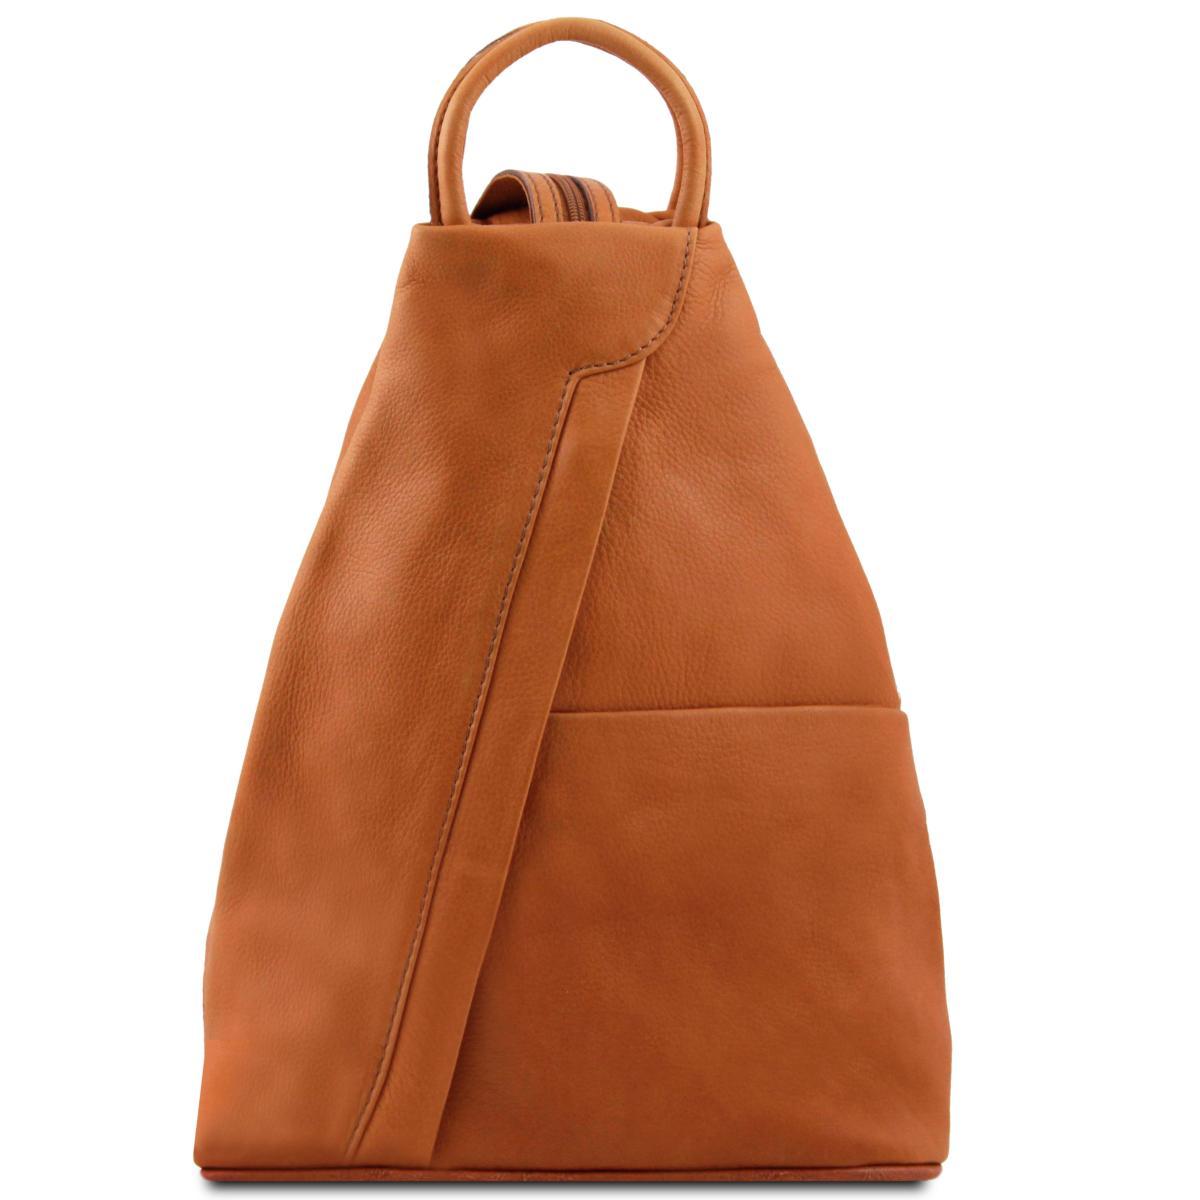 6074b2cc9c Sac à Dos Cuir Ville Femme Camel - Tuscany Leather -